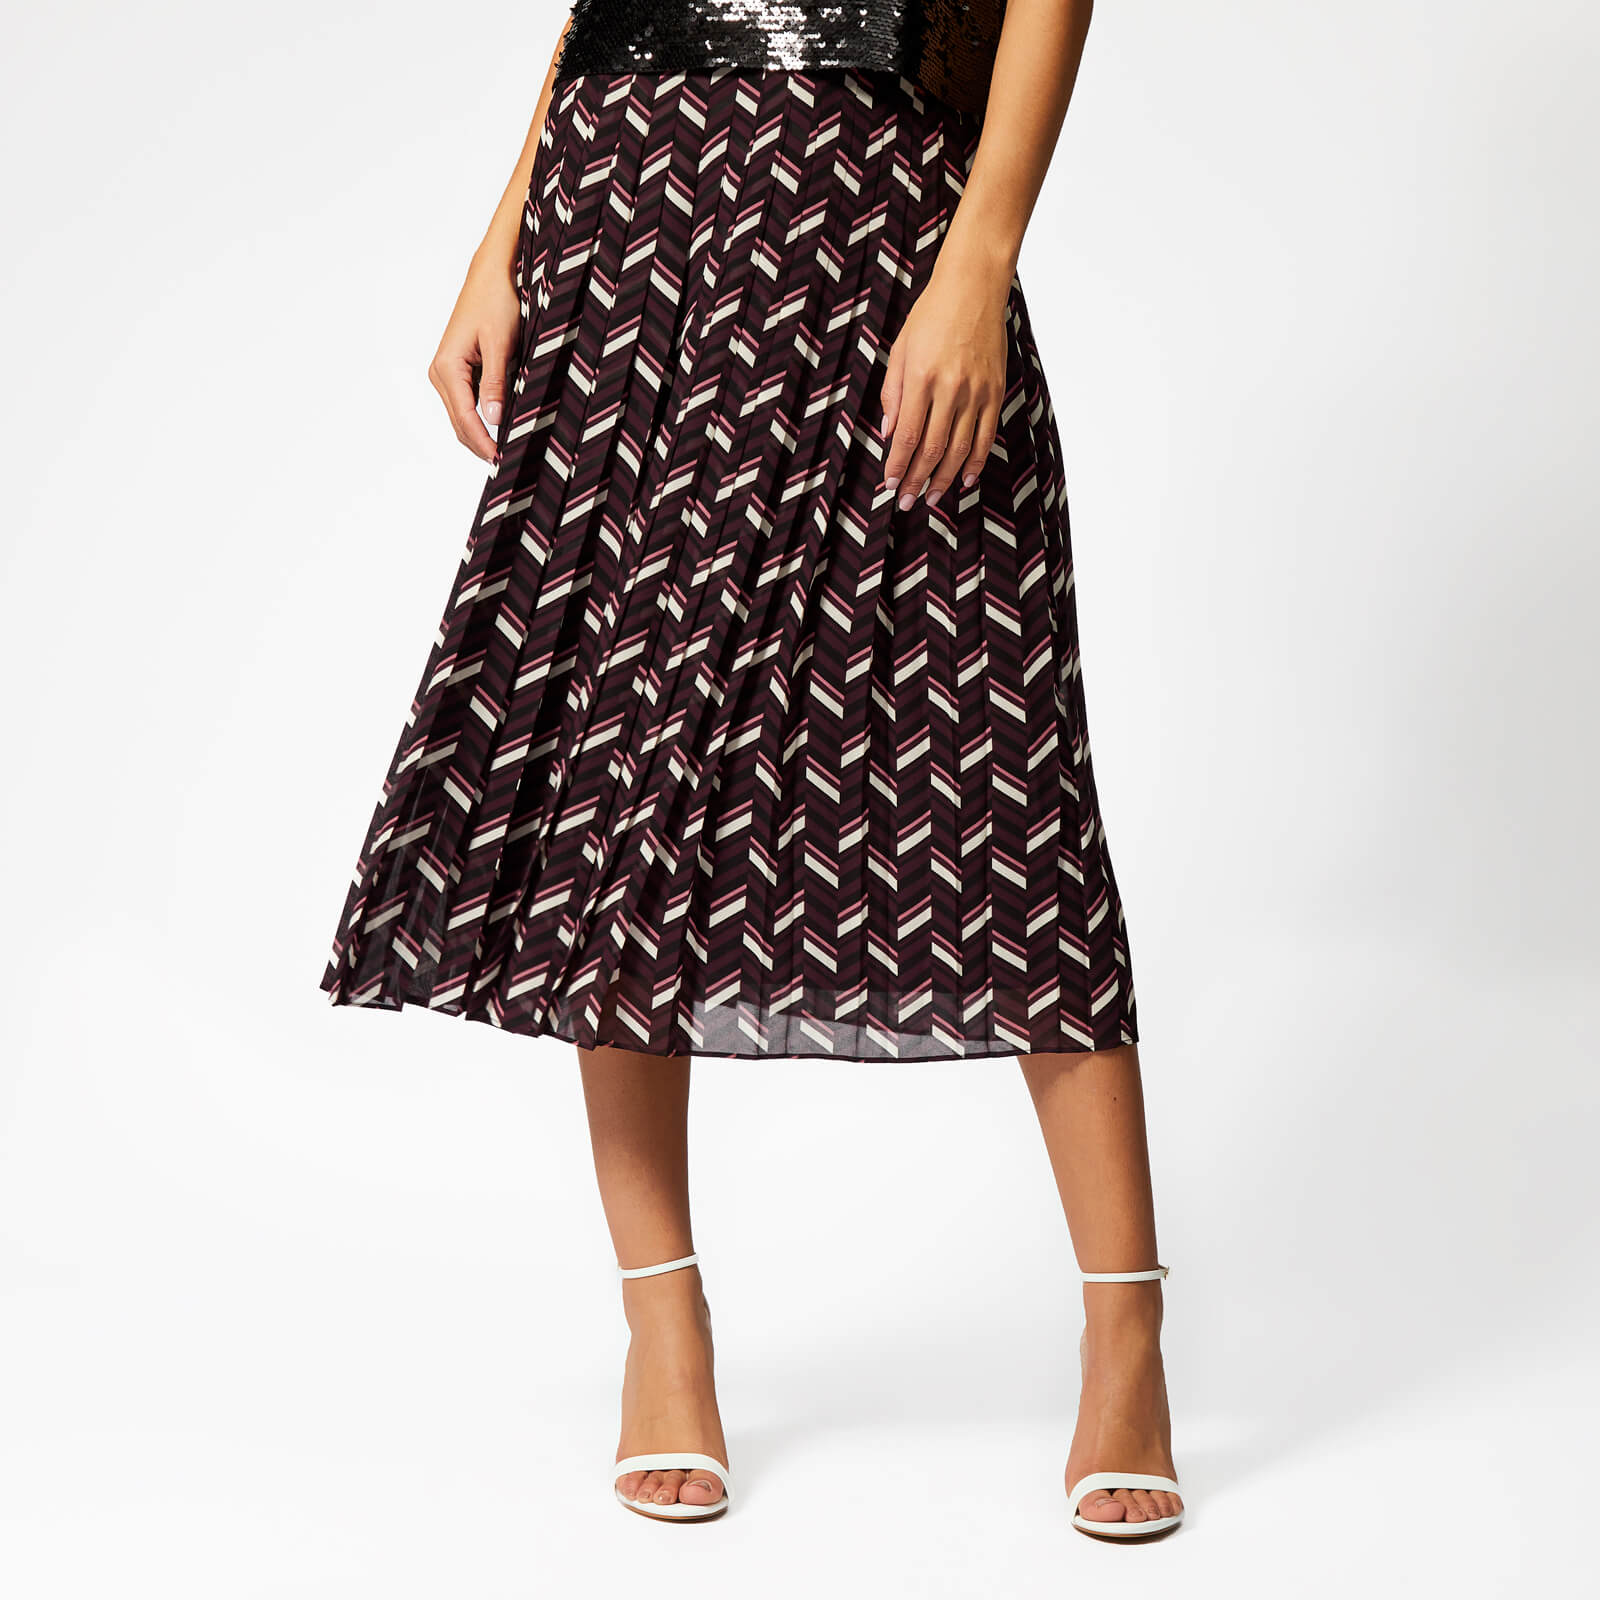 e3ce7021 MICHAEL MICHAEL KORS Women's Chevron Pleat Skirt - Cordovan - Free UK  Delivery over £50